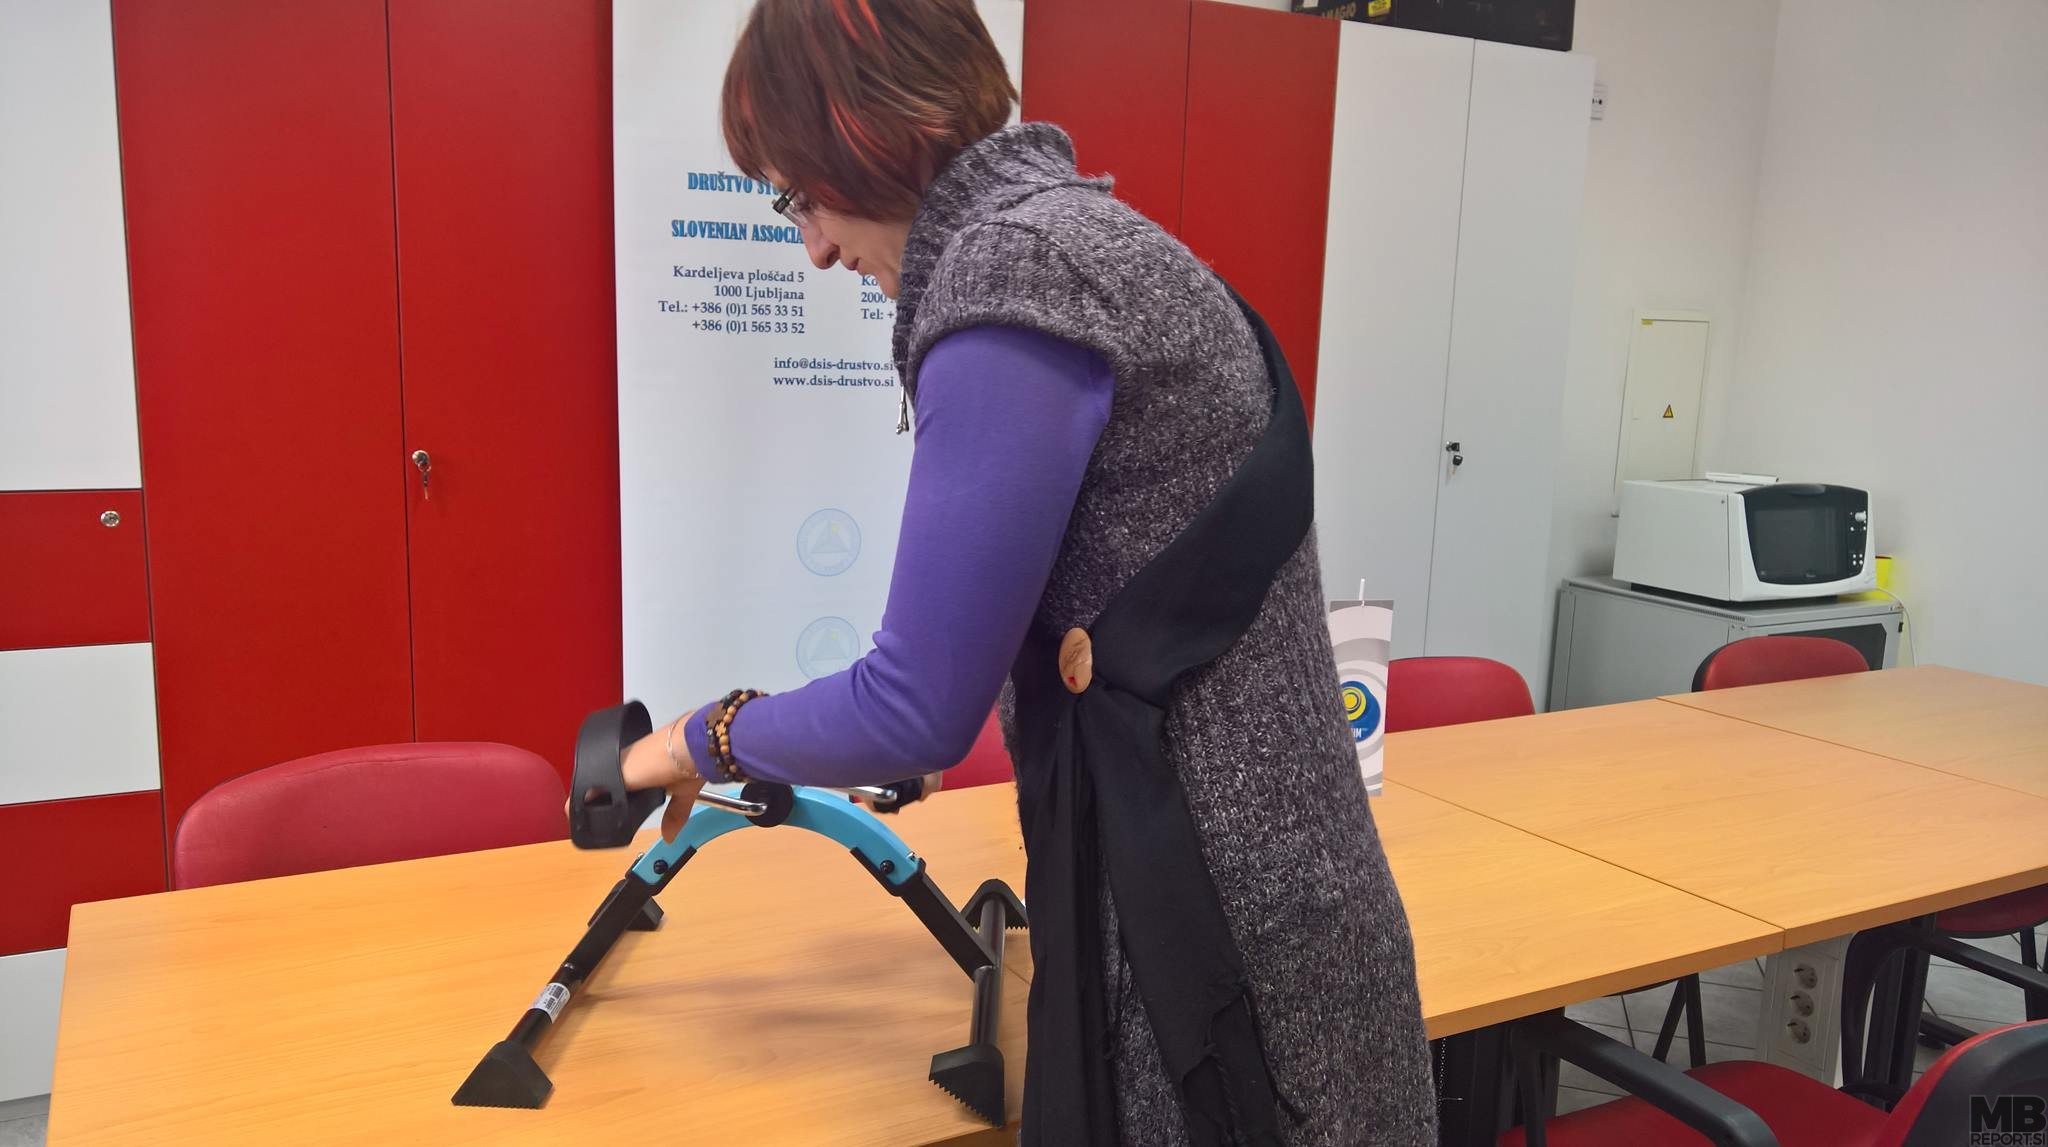 invalidi, pripomočki, šoum